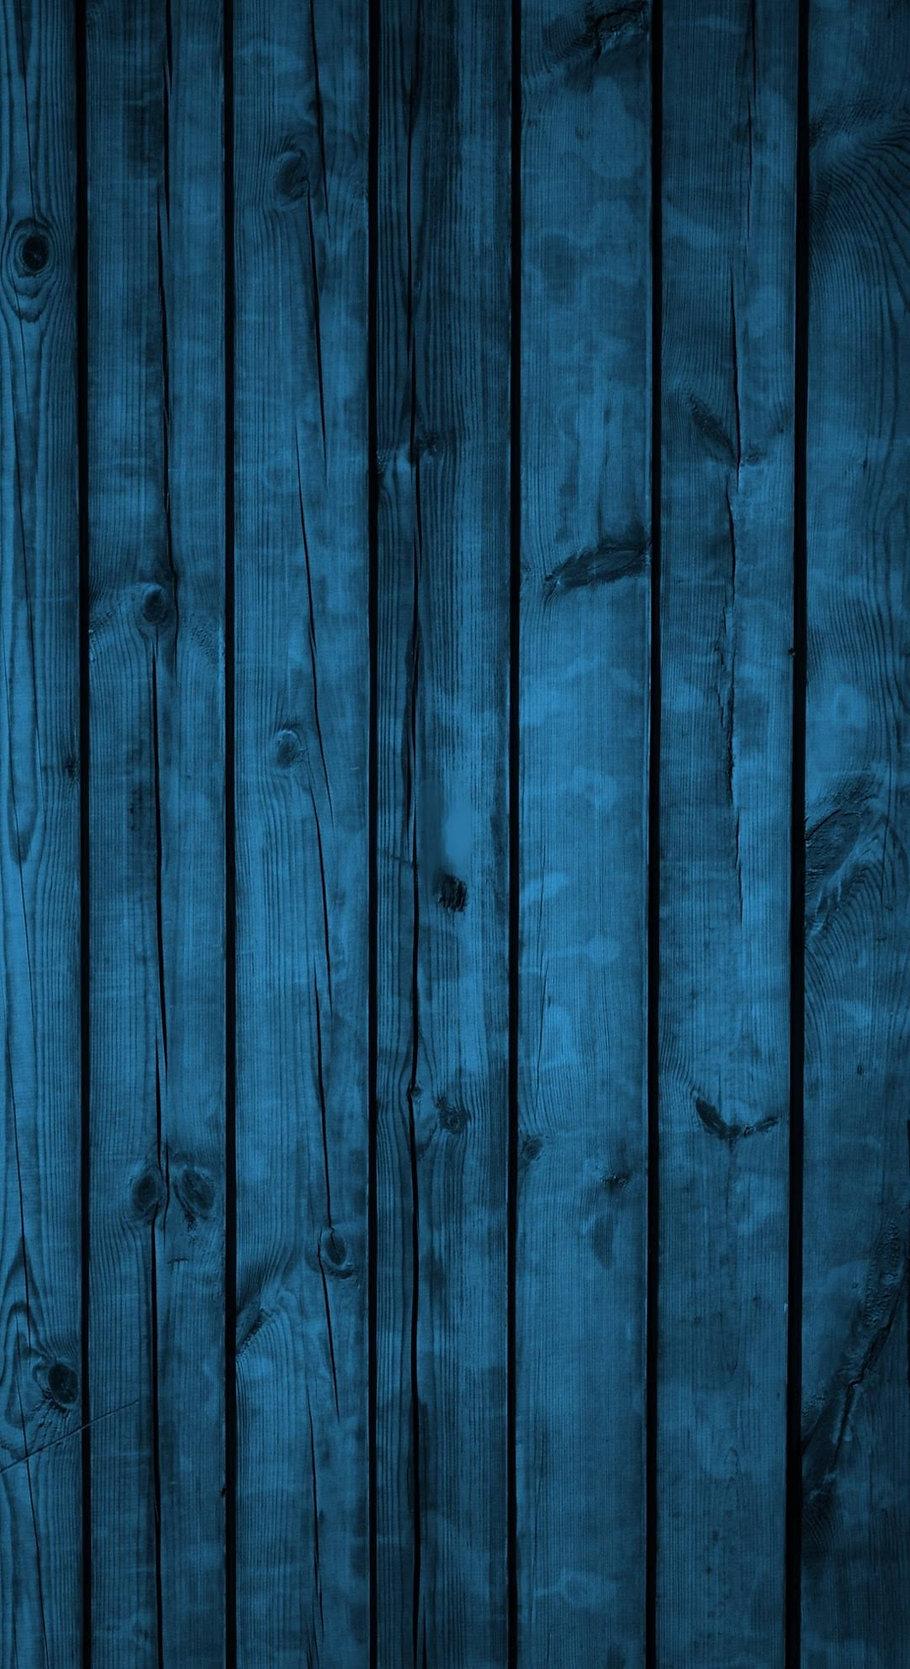 187-1872693_walls-blue-wood-planks-wallp